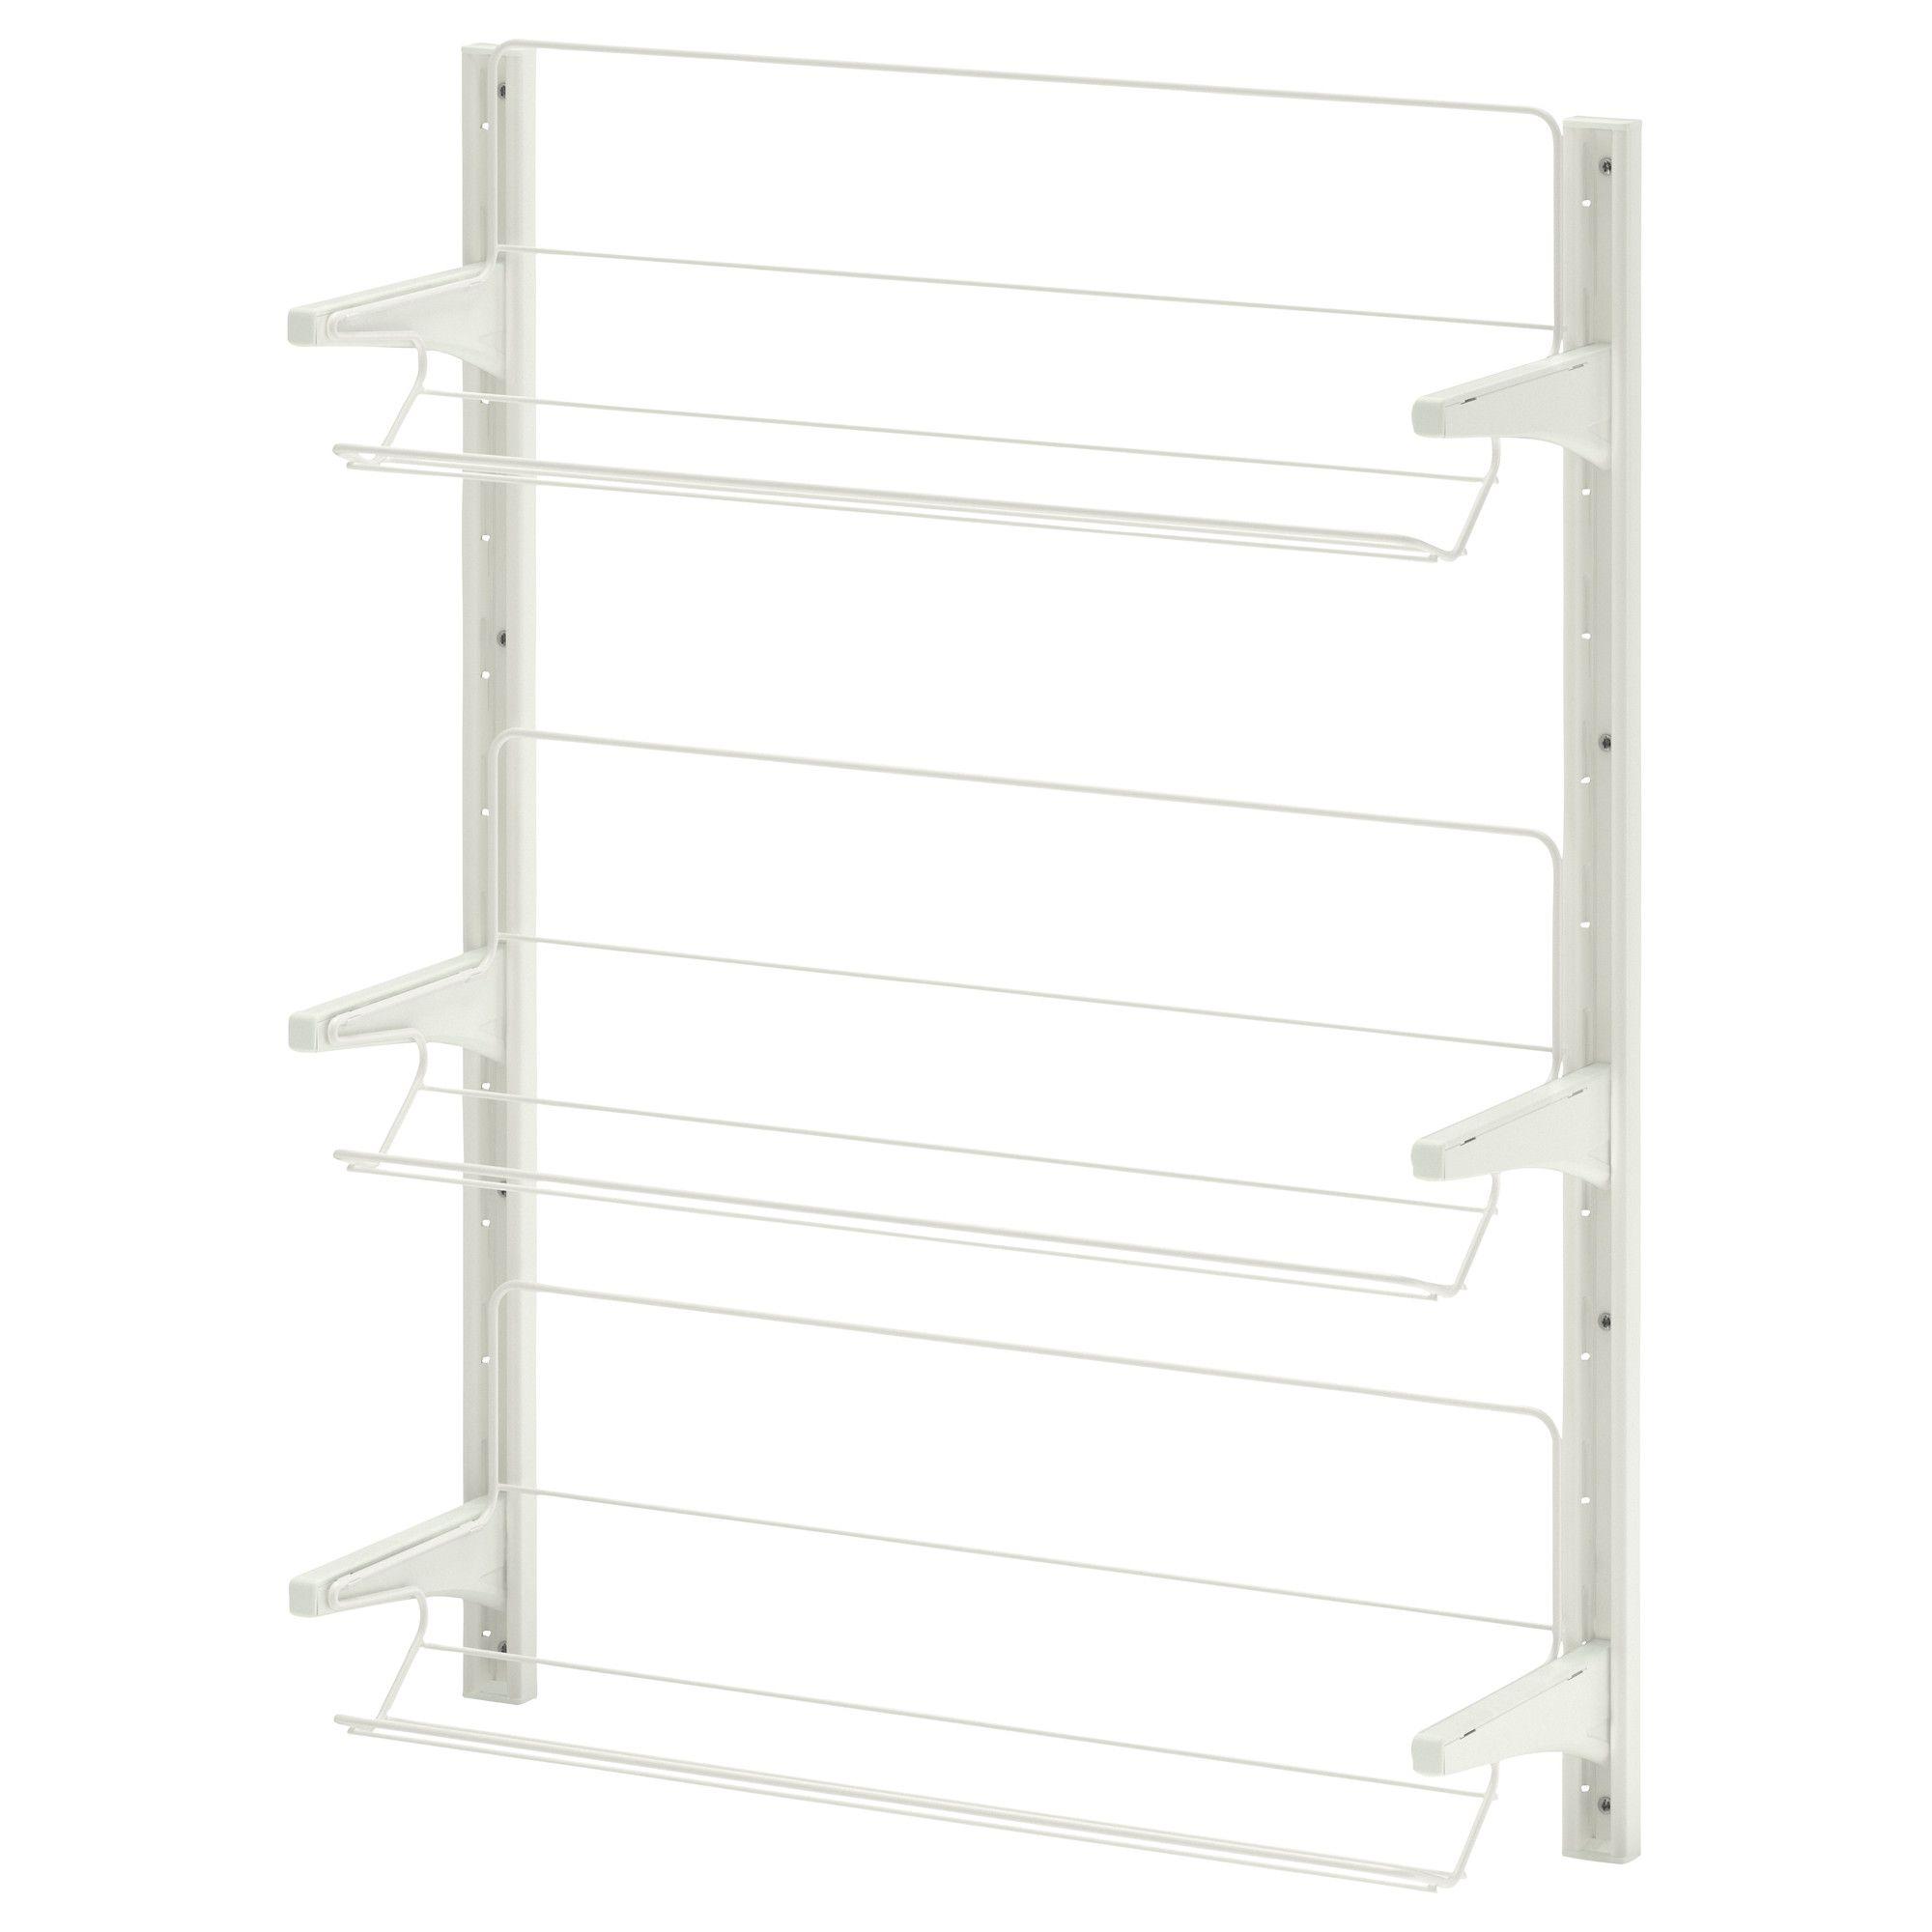 ALGOT Vægstolpe/skohylde - 65x20x84 cm - IKEA